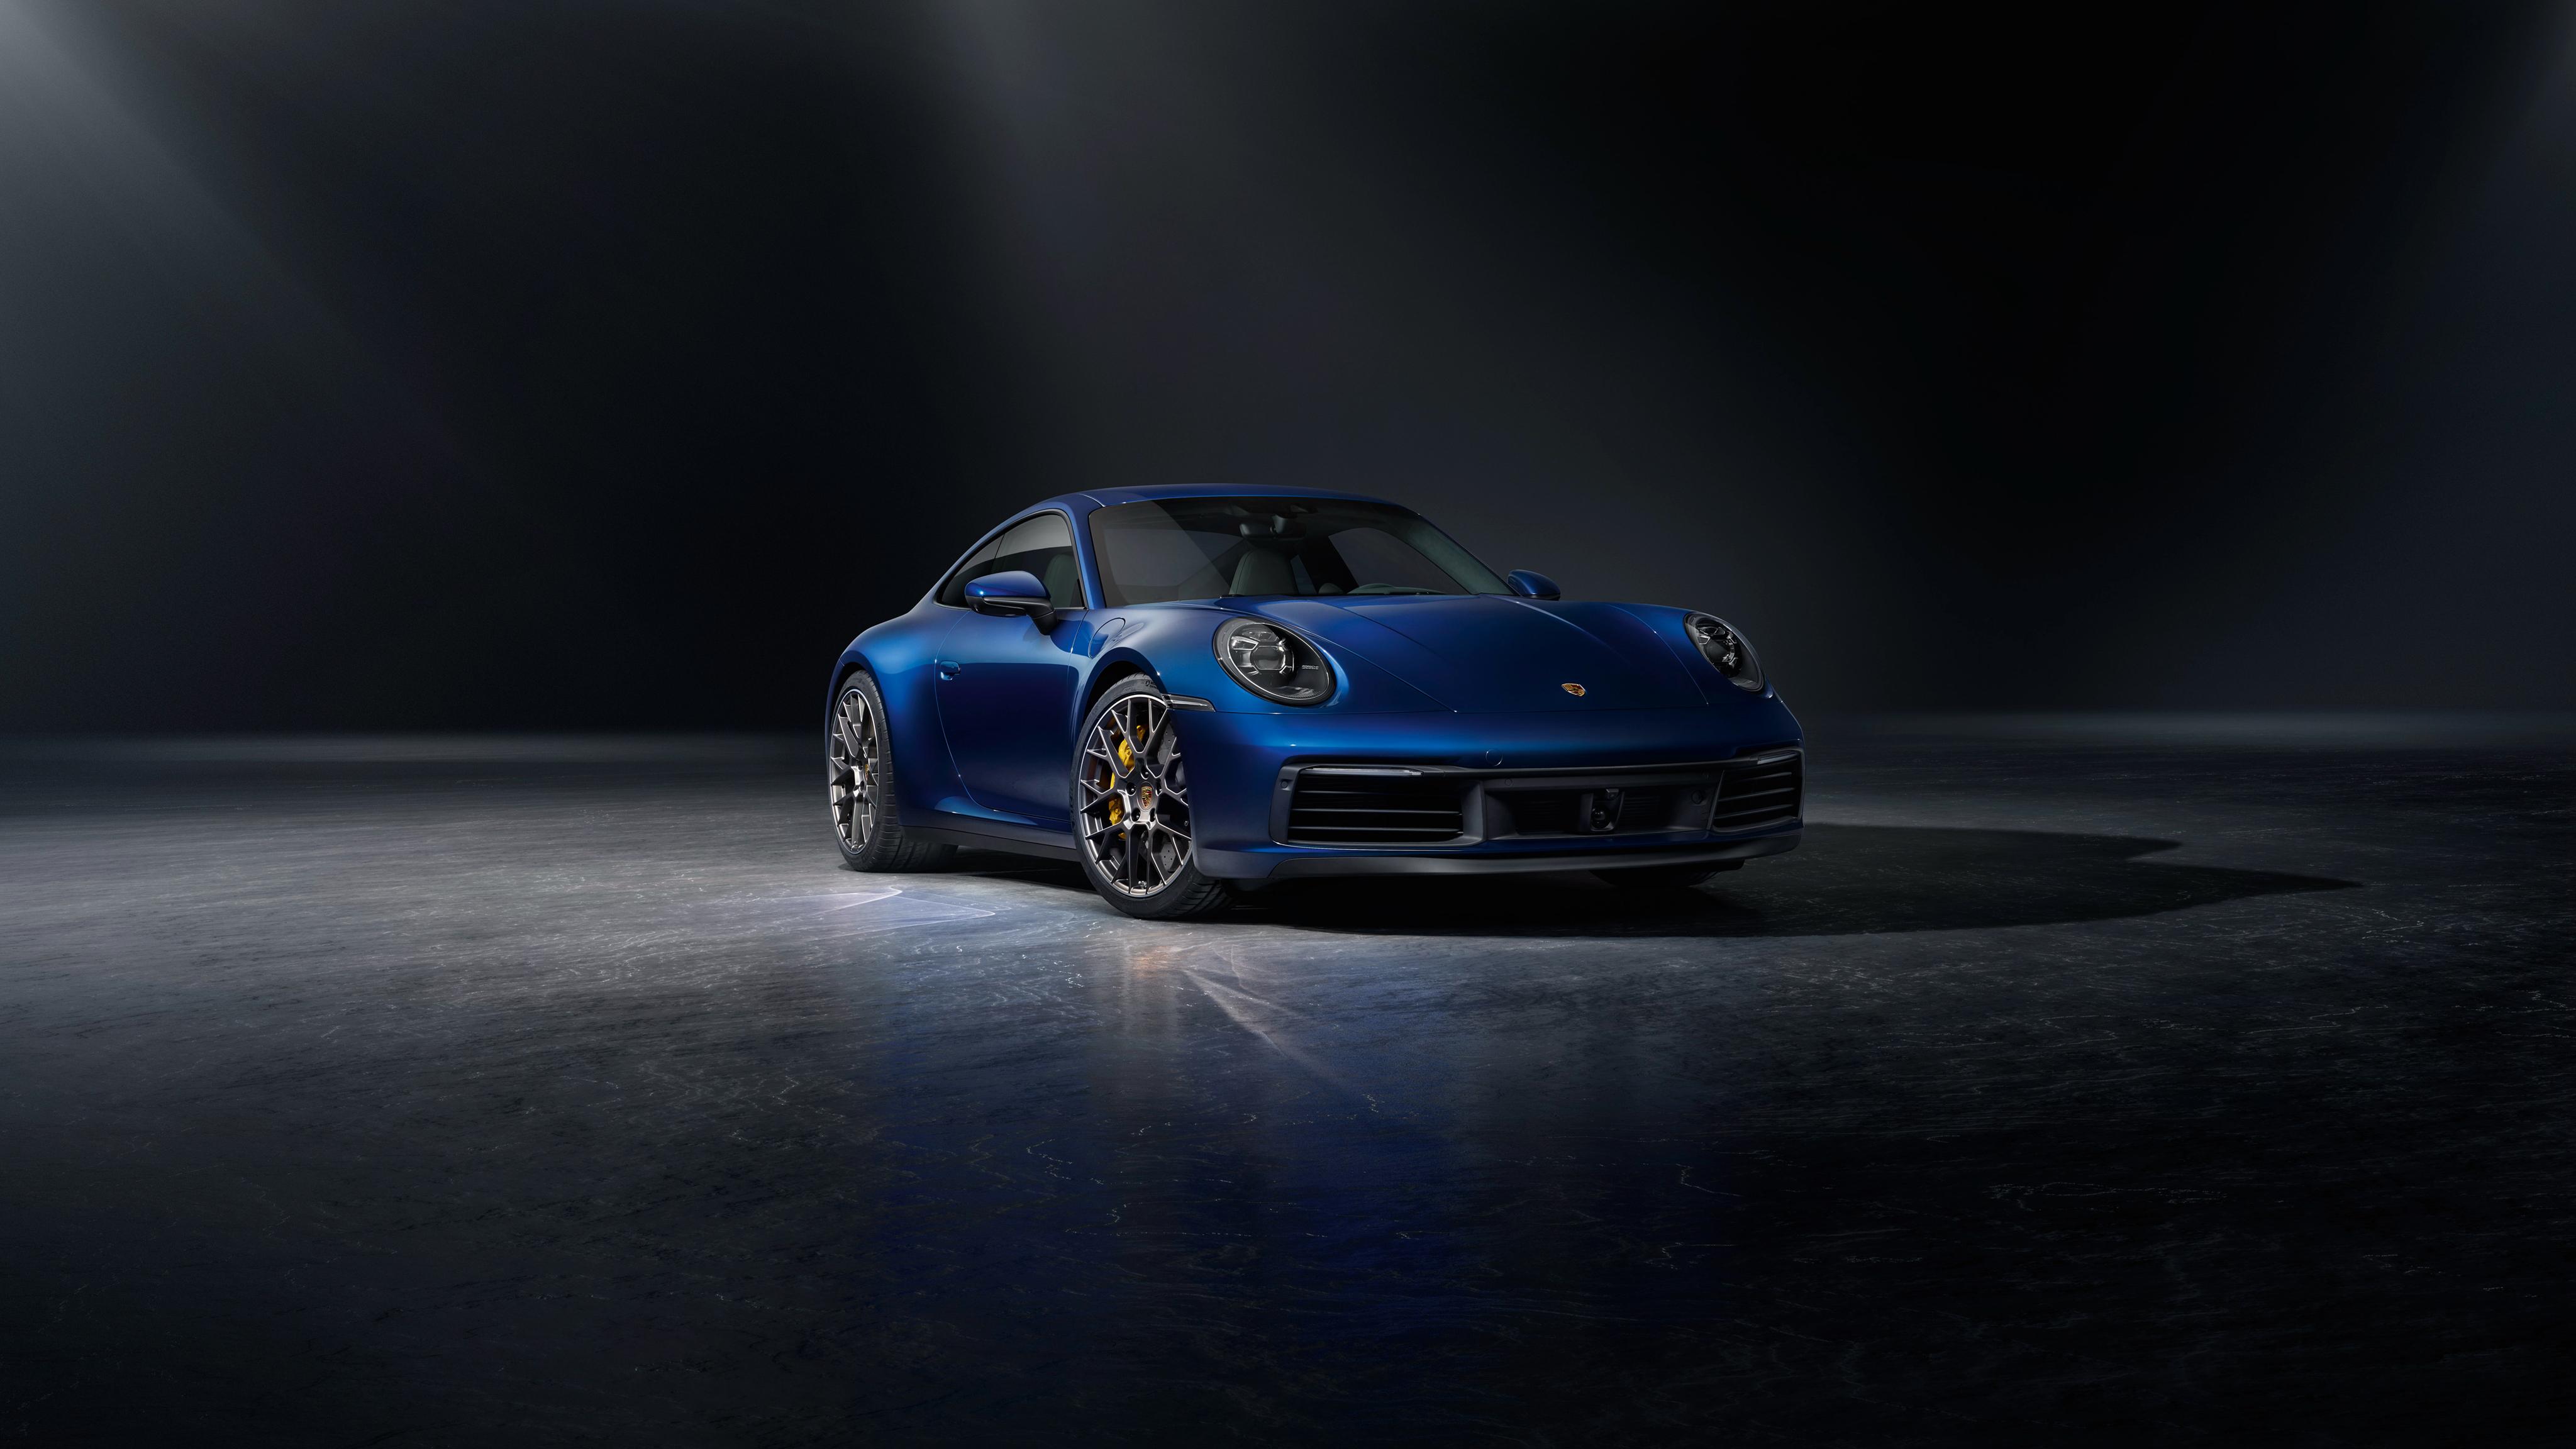 Porsche 911 Carrera 4s 2019 4k Ultra Fondo De Pantalla Hd